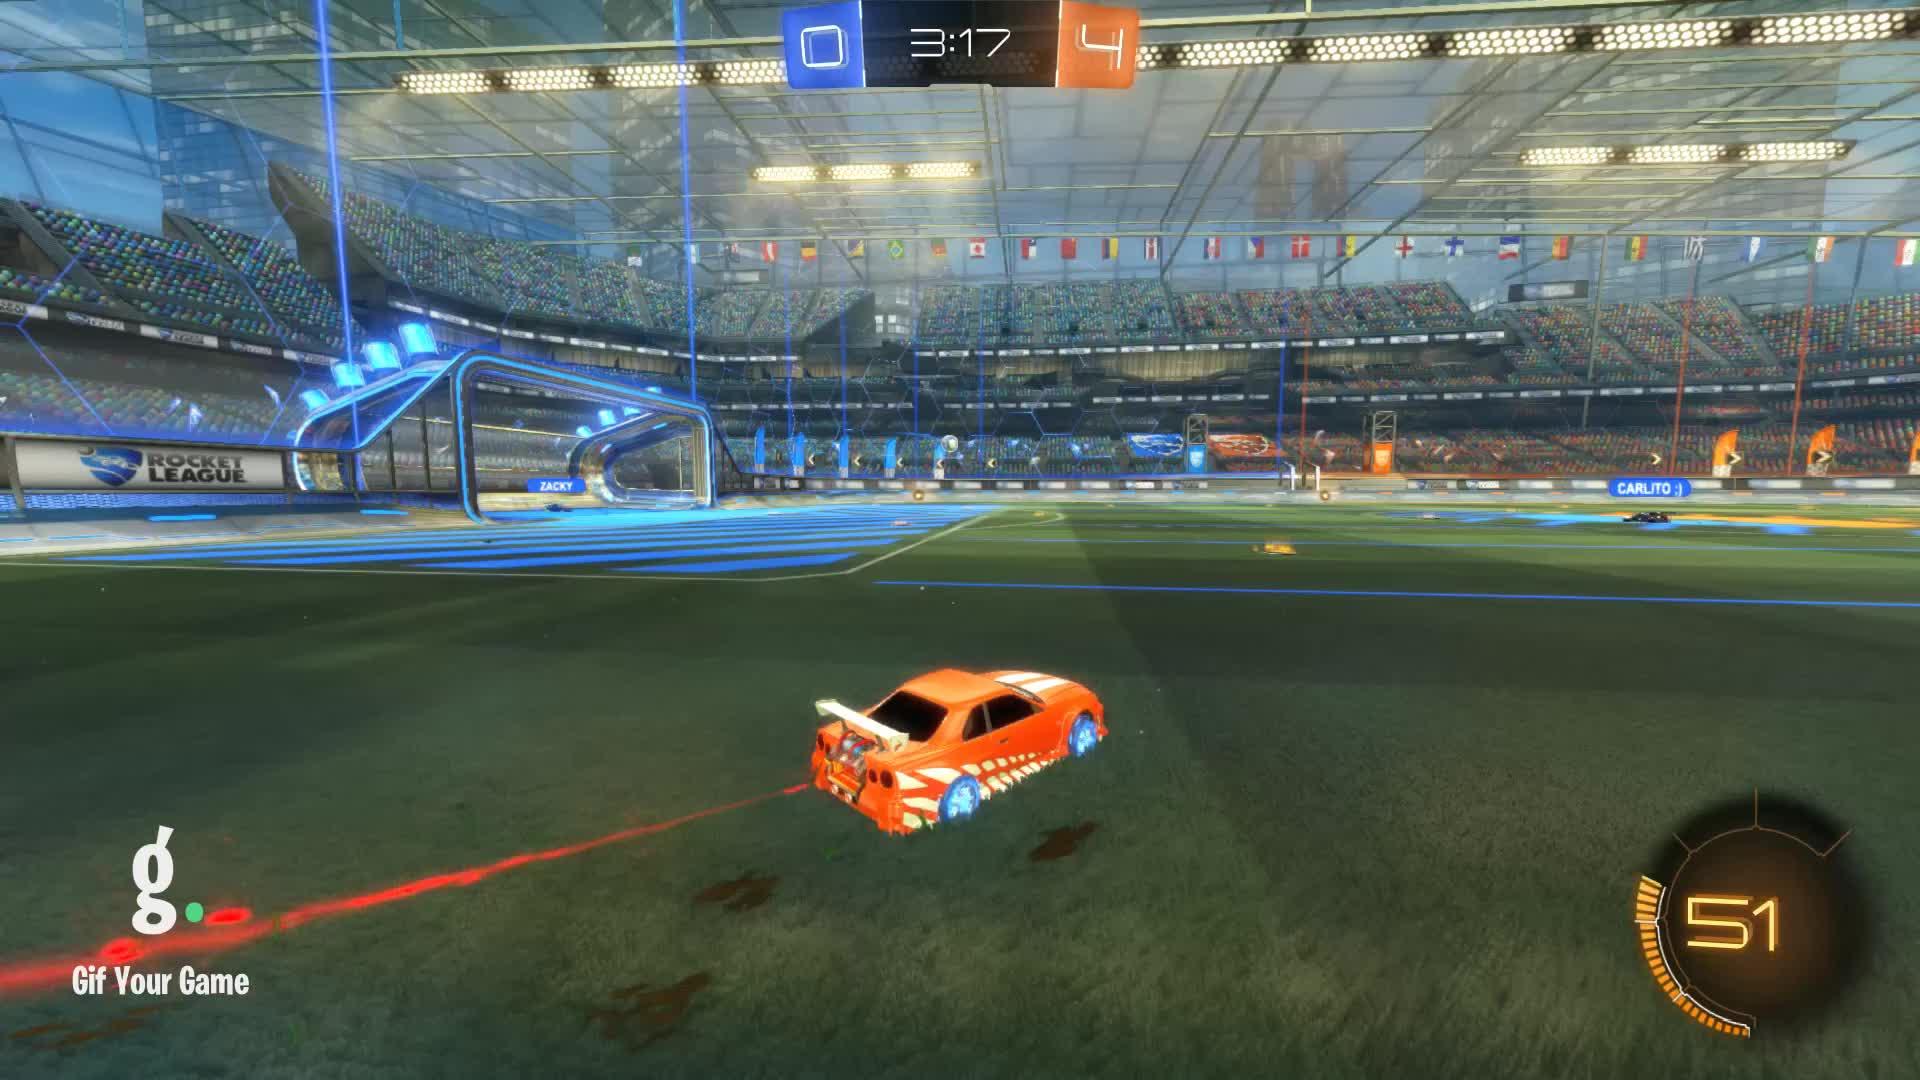 Gif Your Game, GifYourGame, Goal, Rocket League, RocketLeague, Zagge, Goal 5: Zagge GIFs